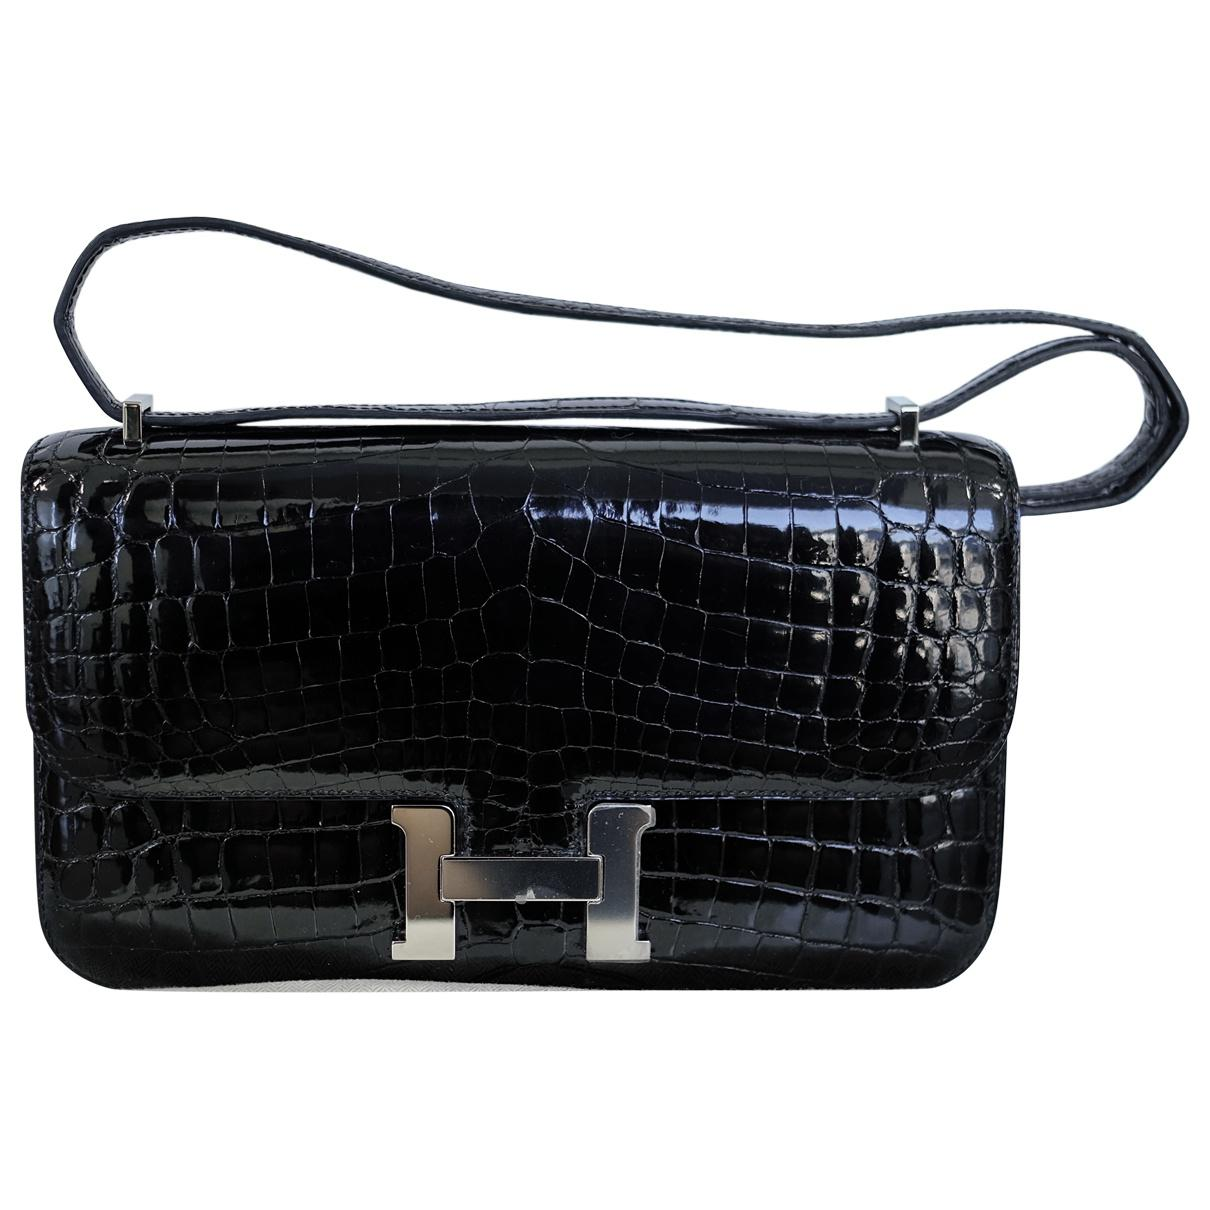 7cfc8b295f63 ... wholesale hermès. womens black constance elan crocodile handbag 8afb6  7c3f5